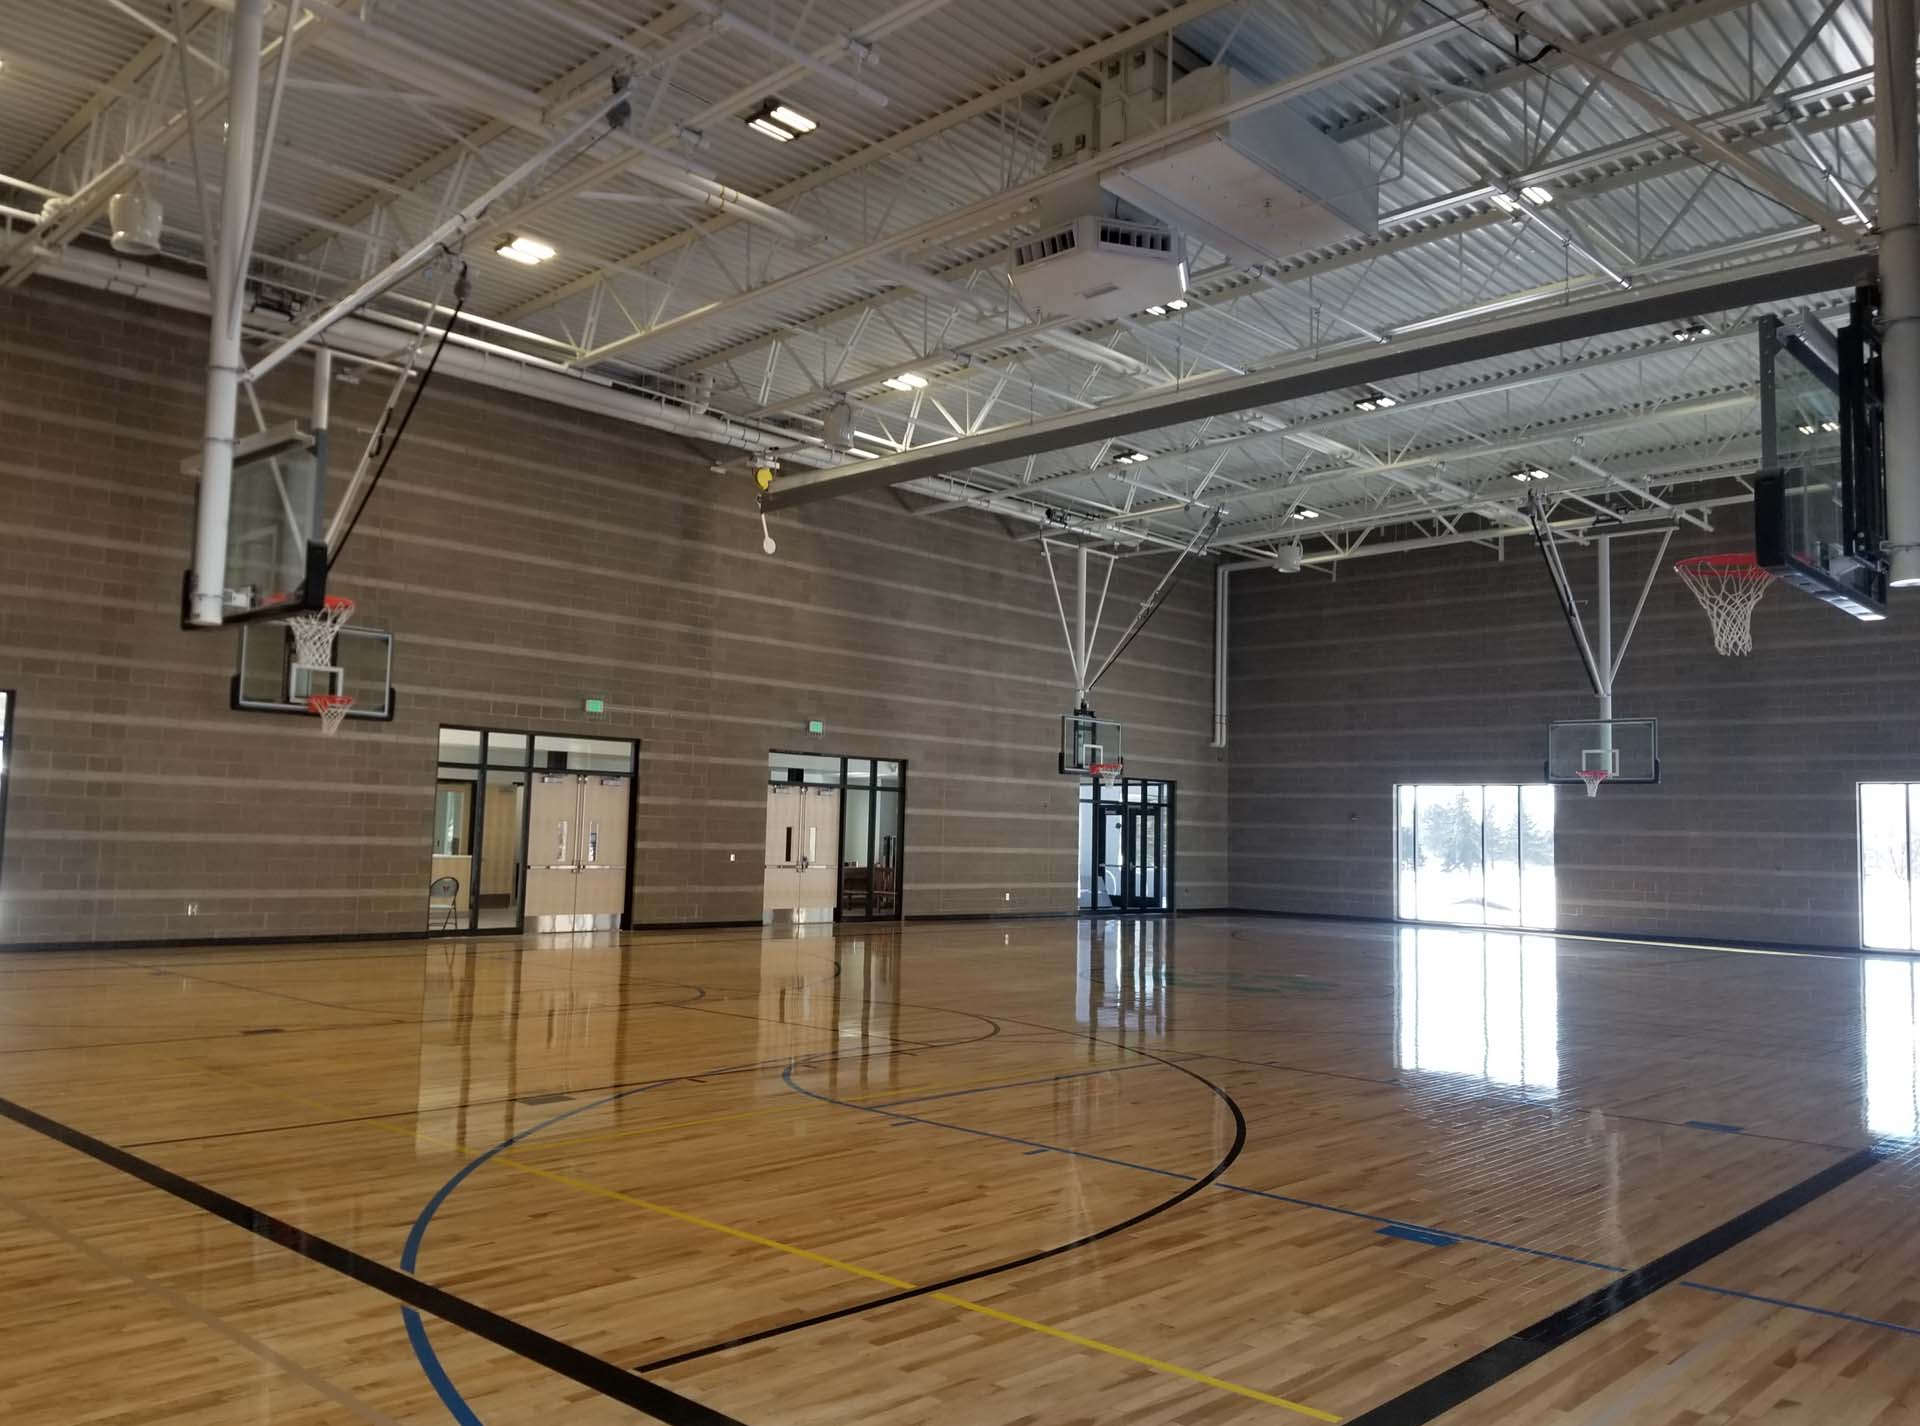 NE Athletic Field Park & Rec Building